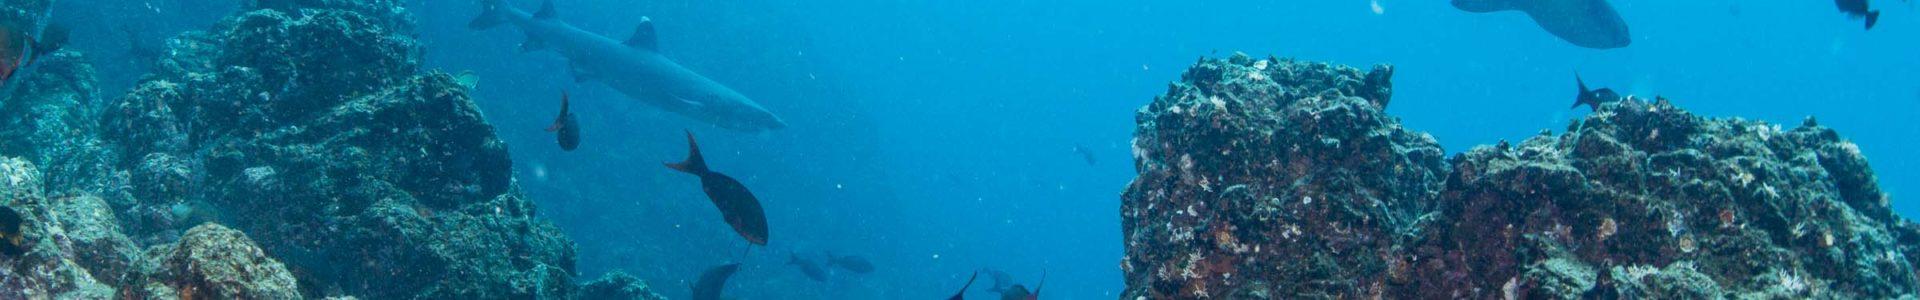 Environmentally Responsible Marine Tours